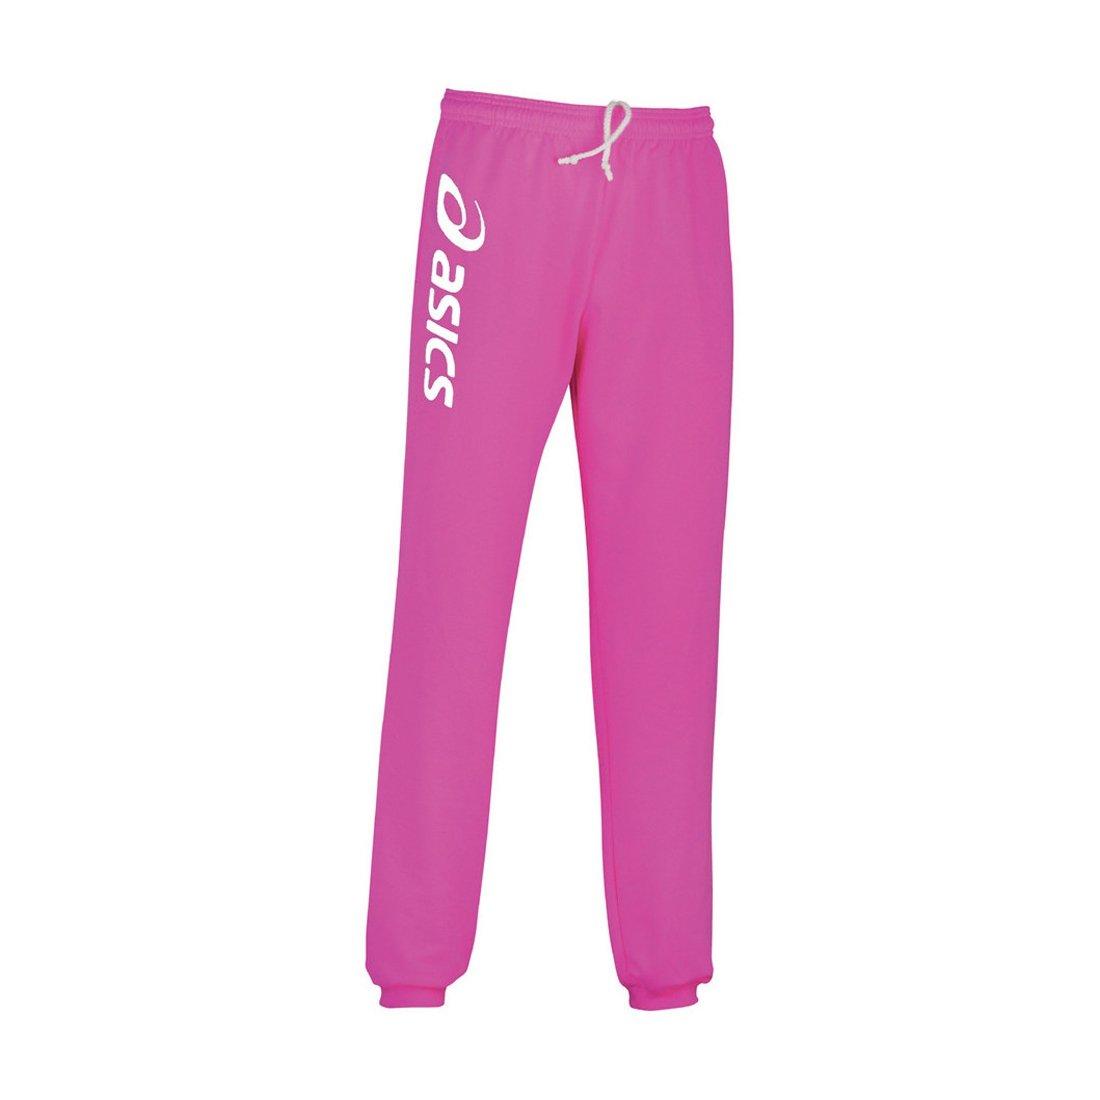 Asics - Chándal - para hombre, Unisex adulto, color rosa, tamaño ...